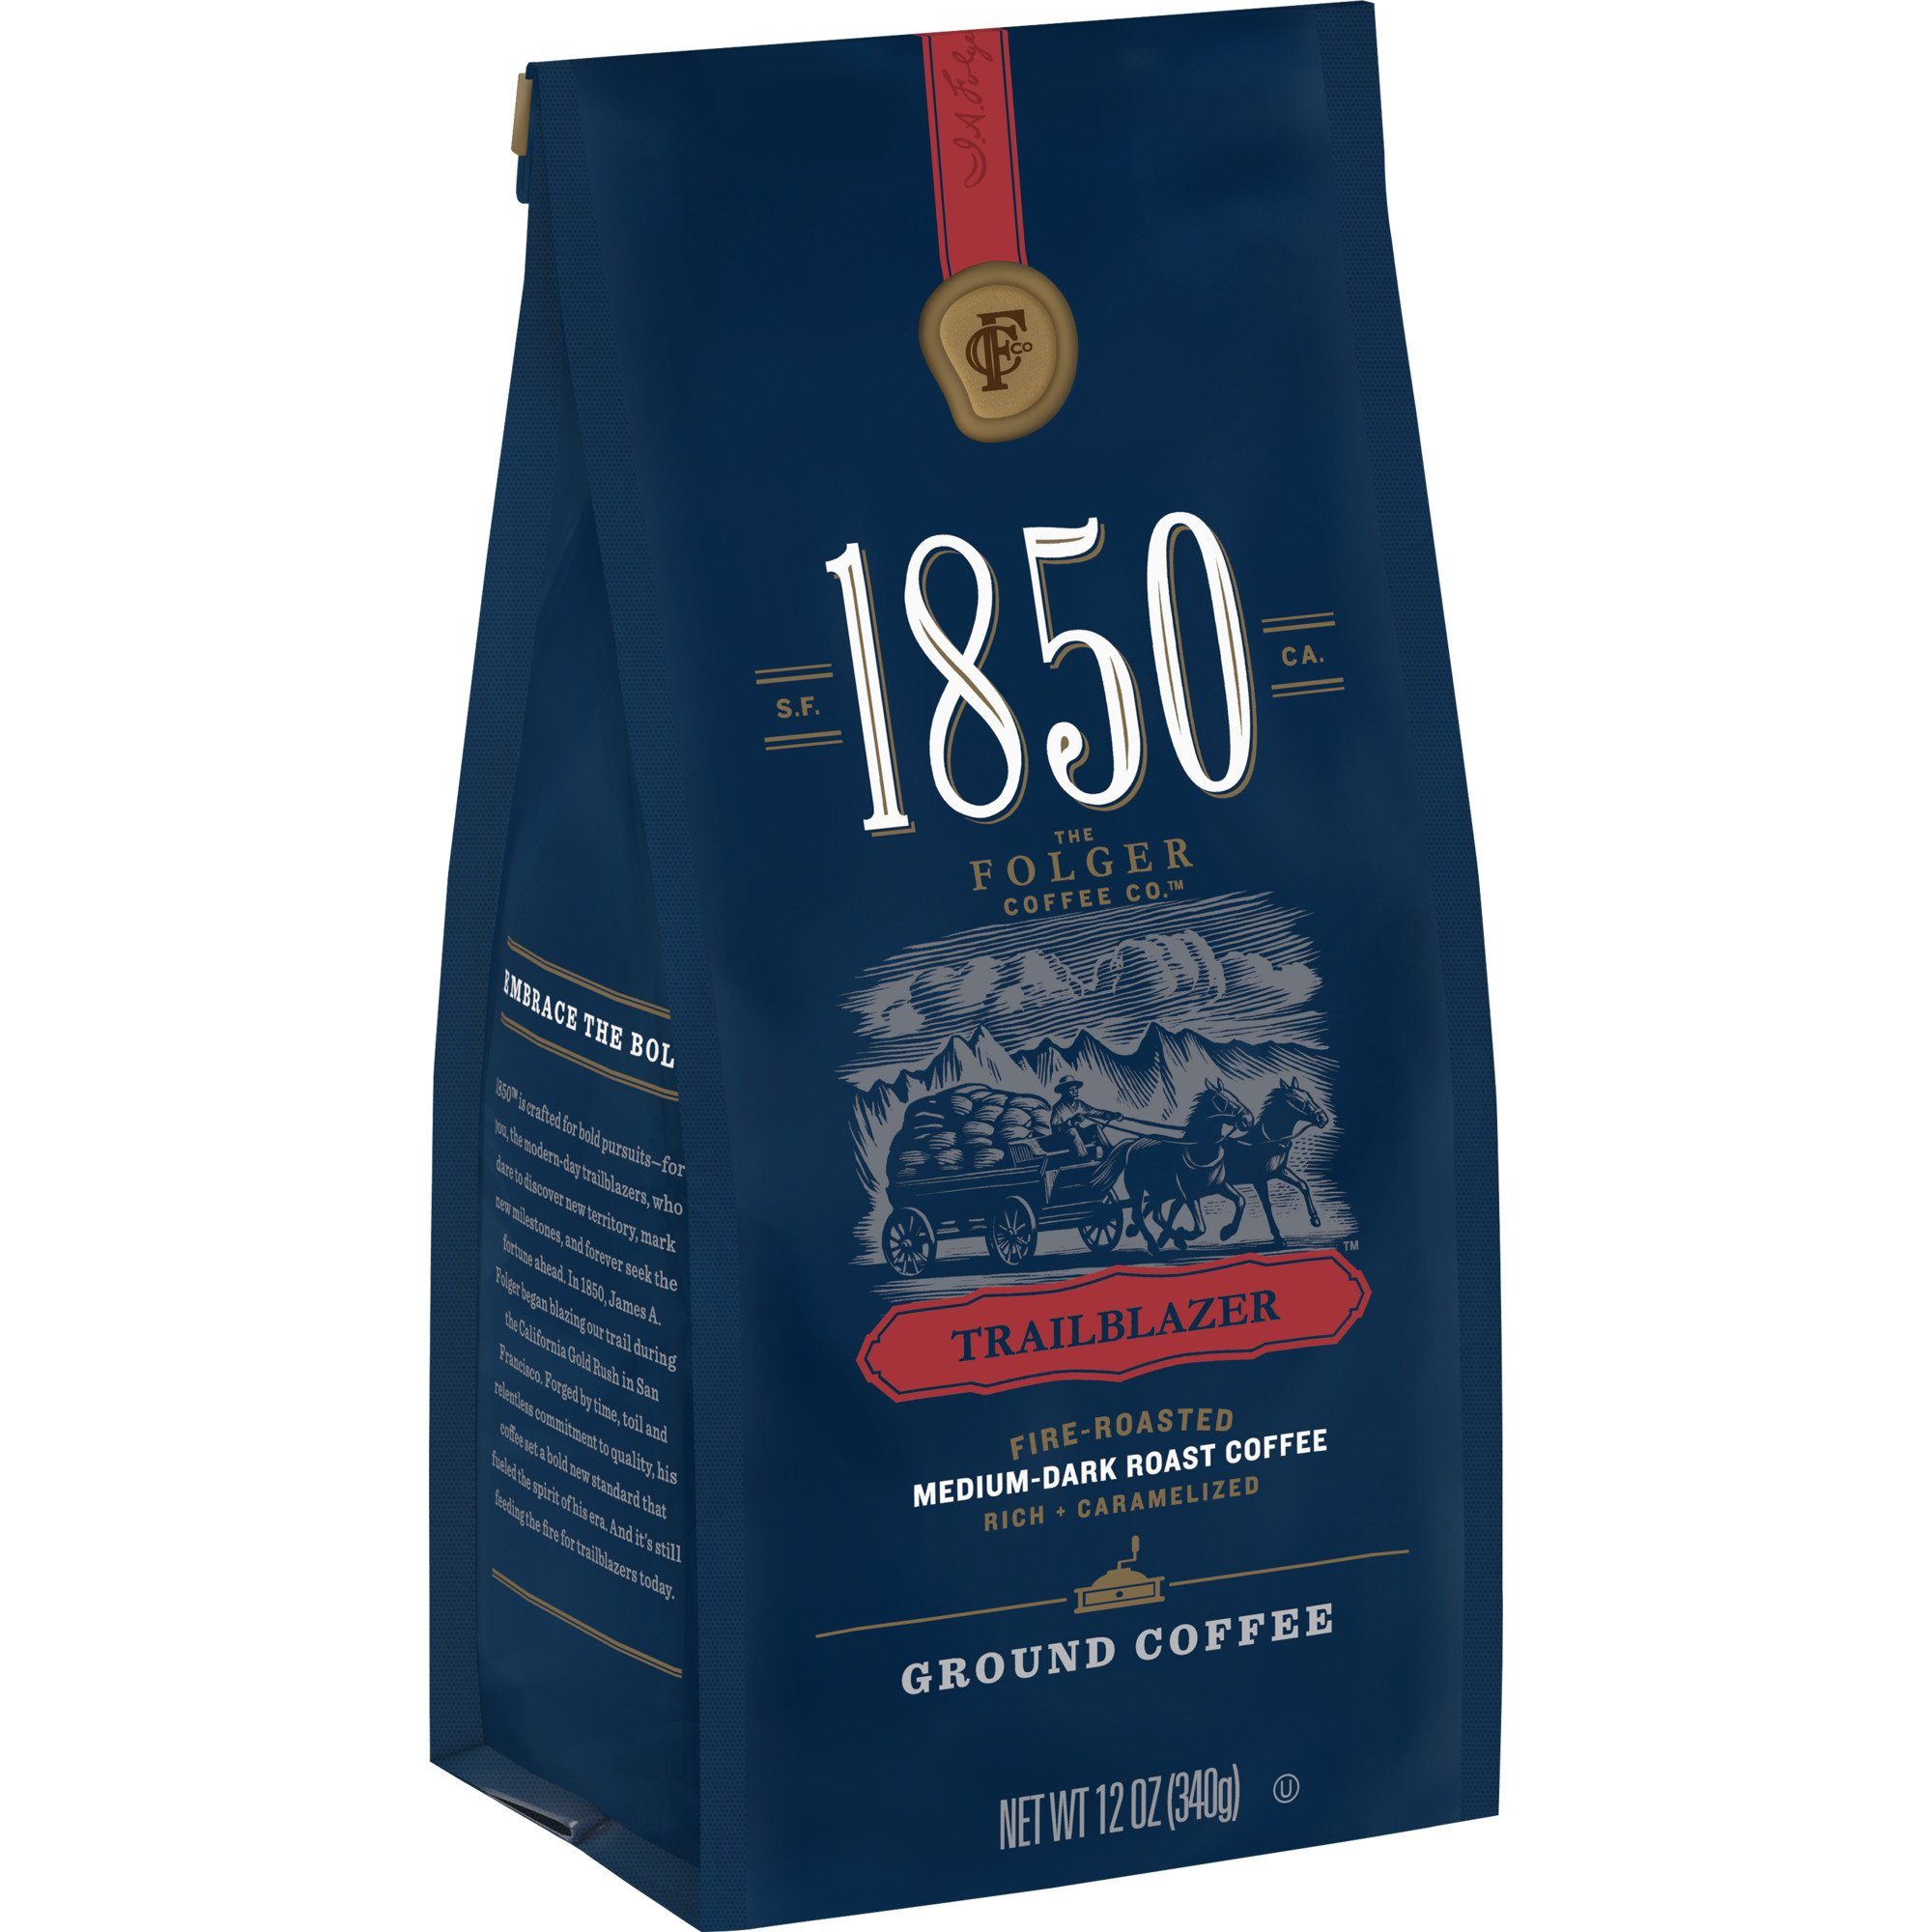 1850 Trailblazer, Medium-Dark Roast Ground Coffee, 12 Ounces (Pack of 6)